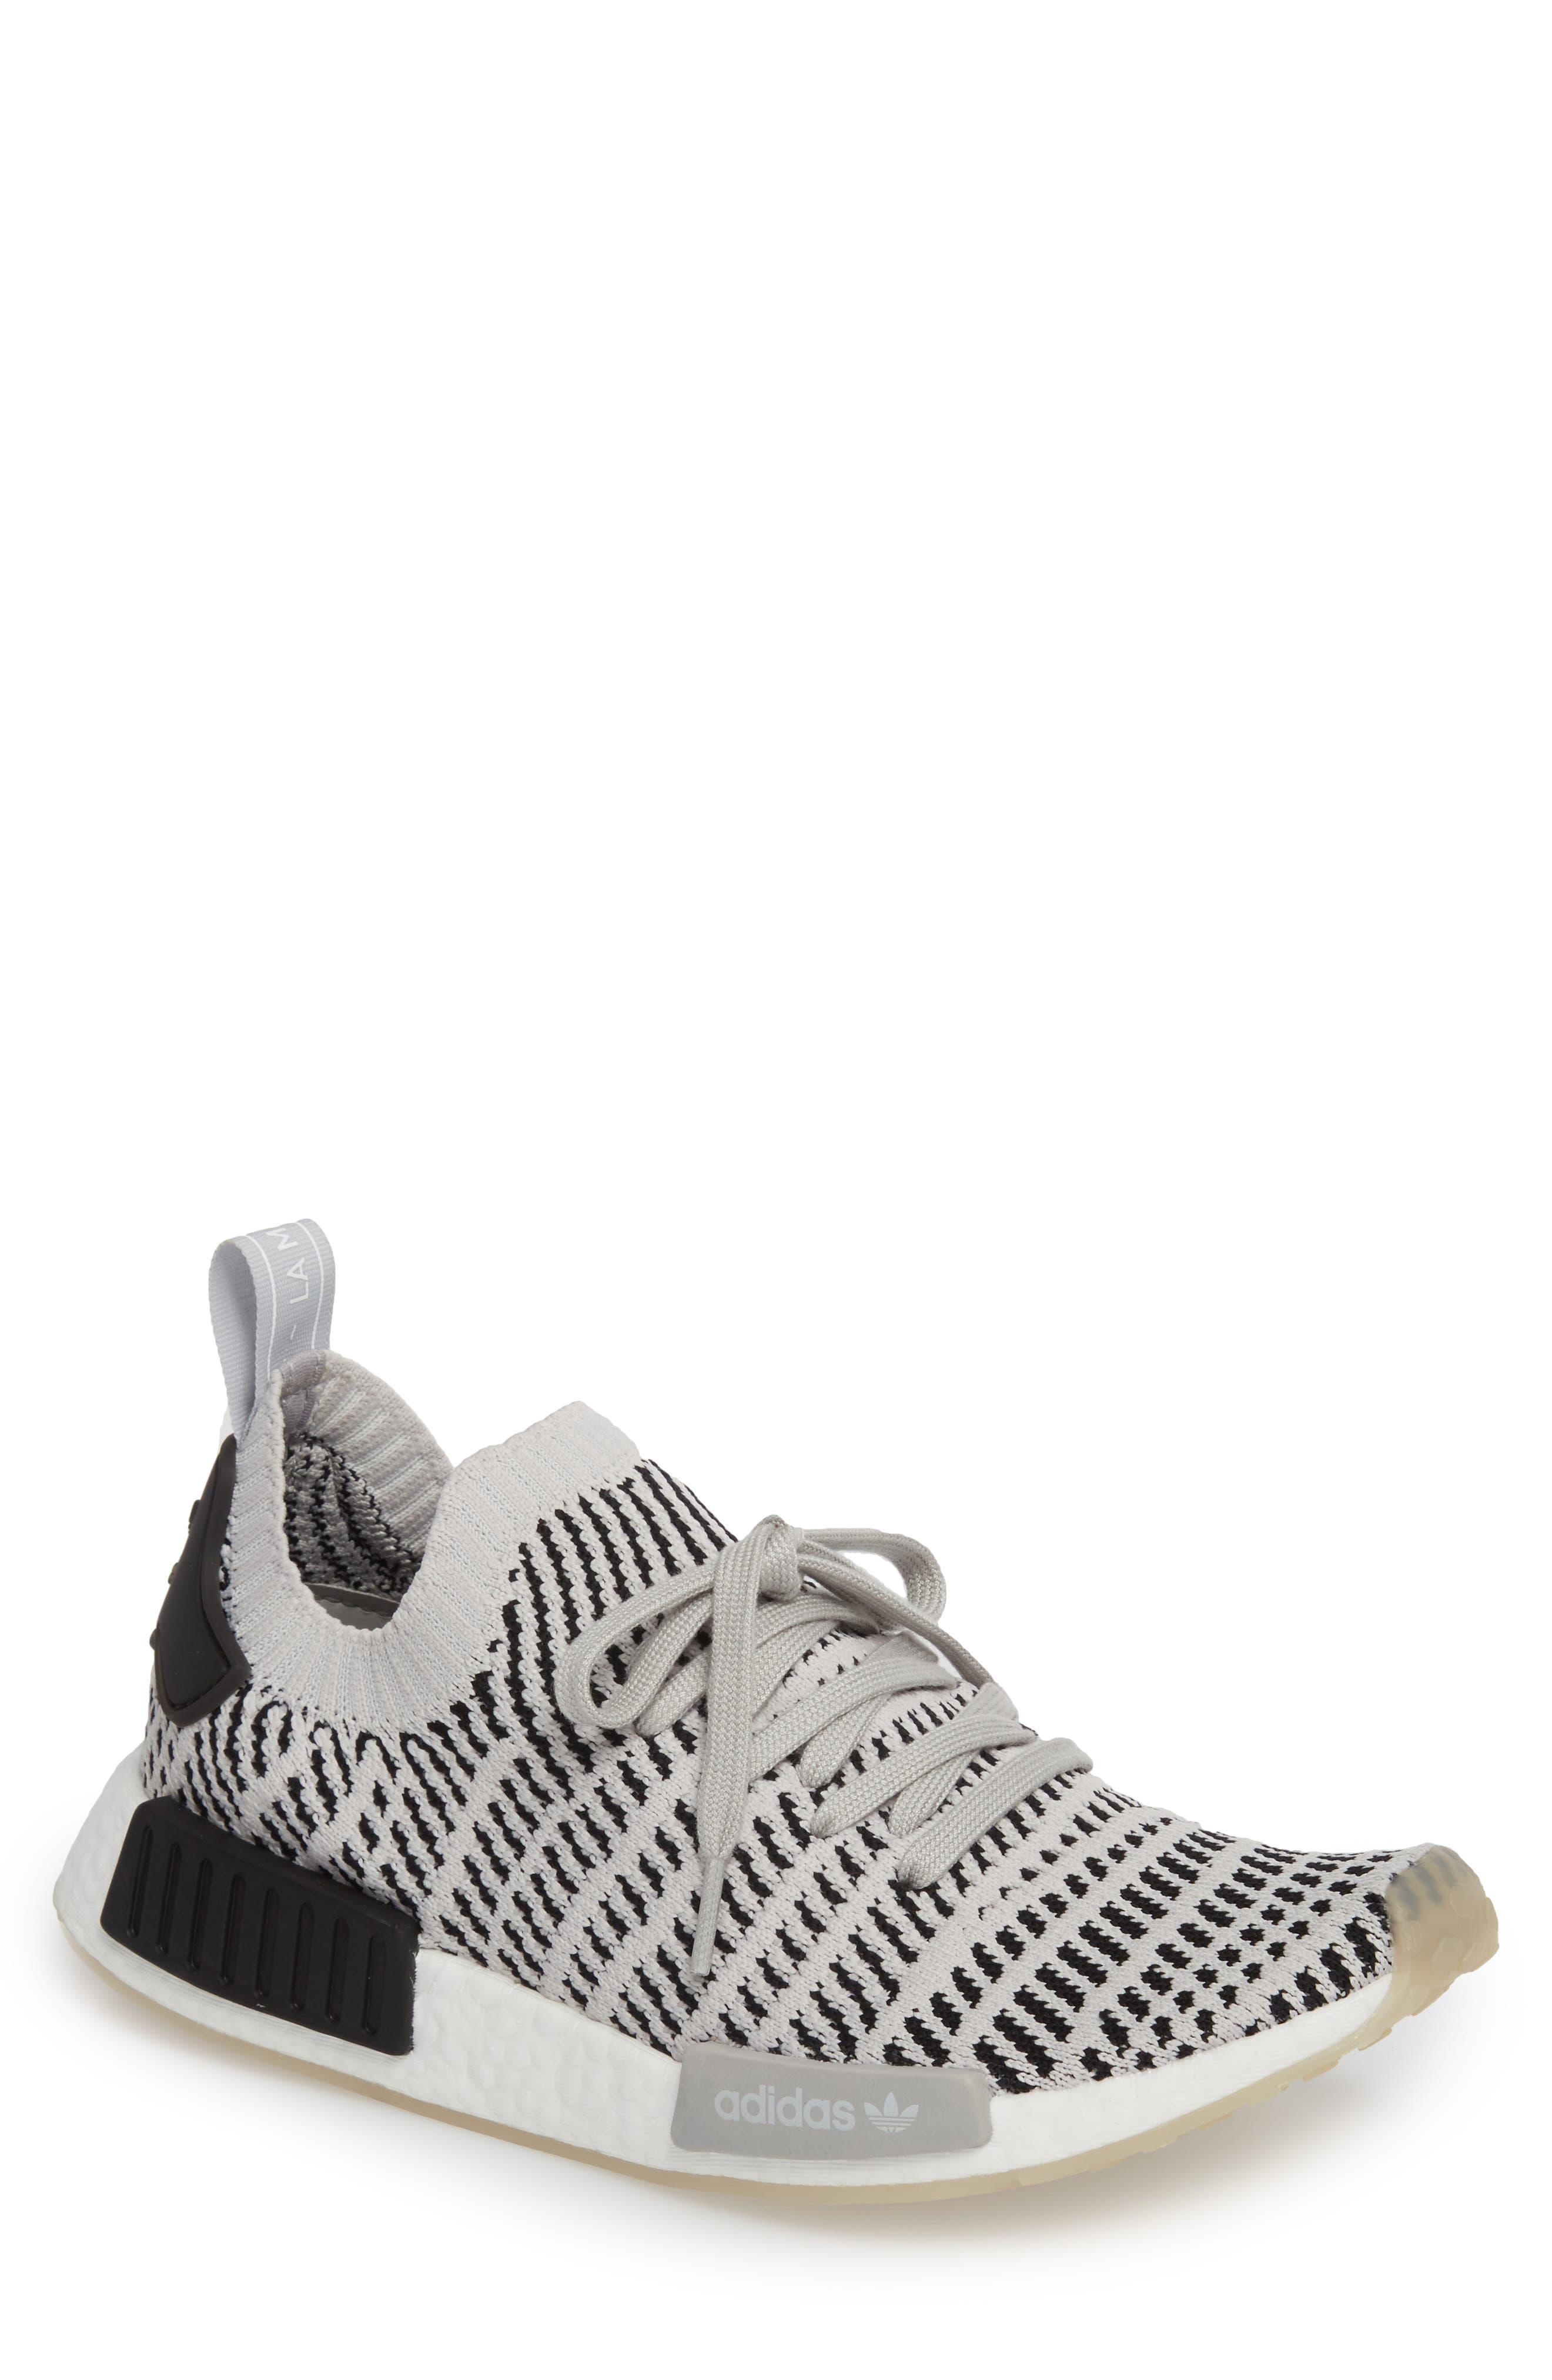 NMD R1 STLT Primeknit Sneaker,                             Main thumbnail 1, color,                             033